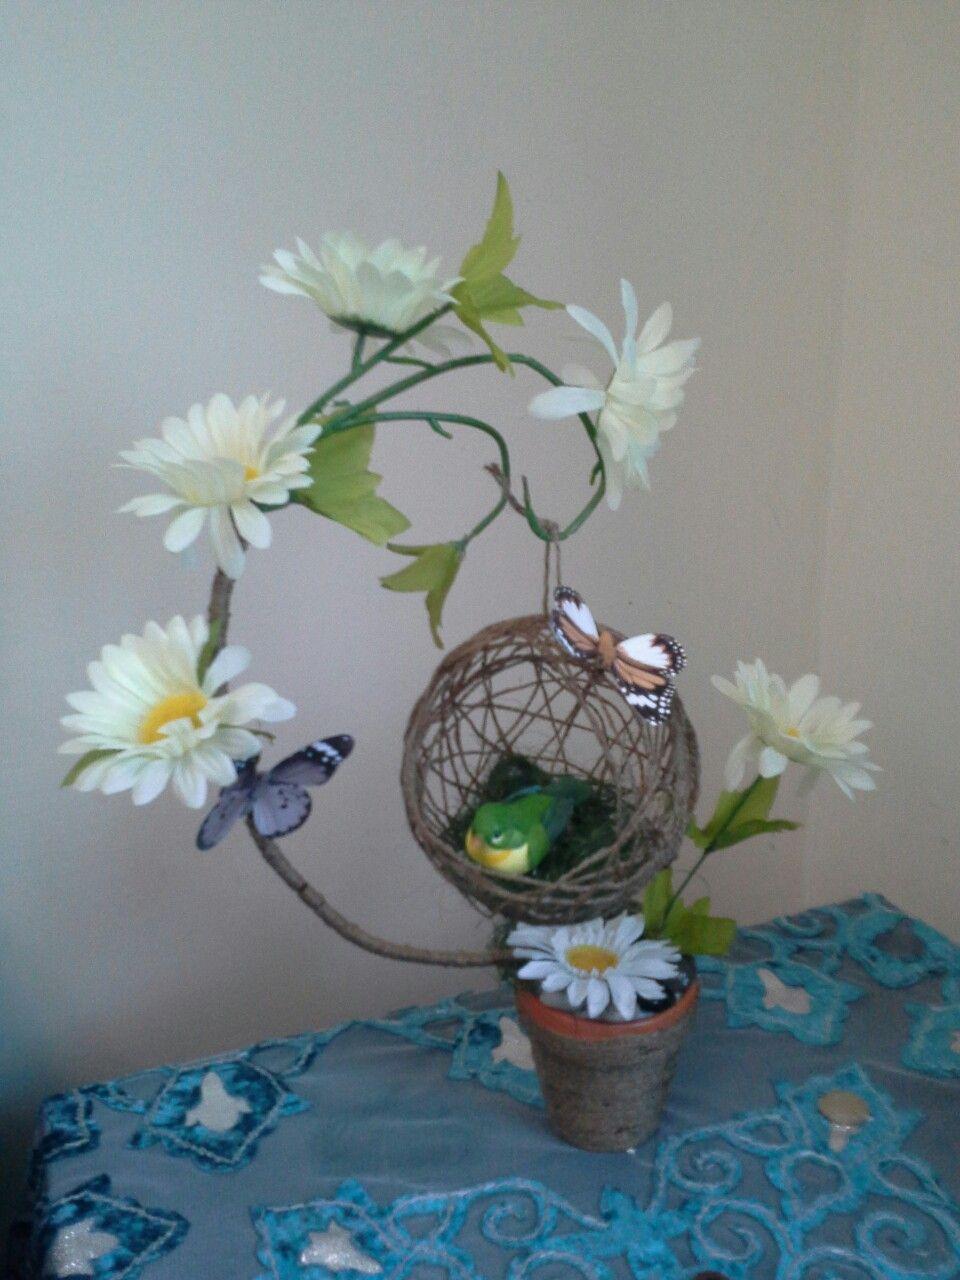 Pin by jana sayed on flower pinterest flower